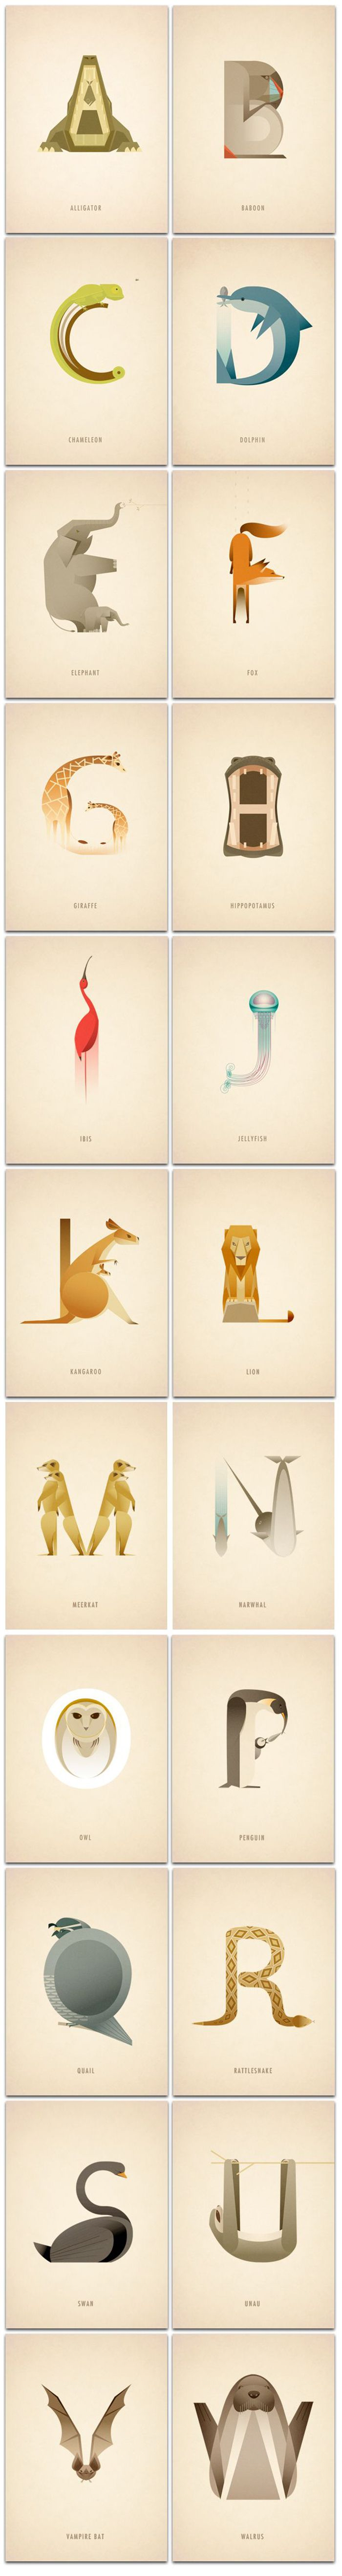 vintage animal typography